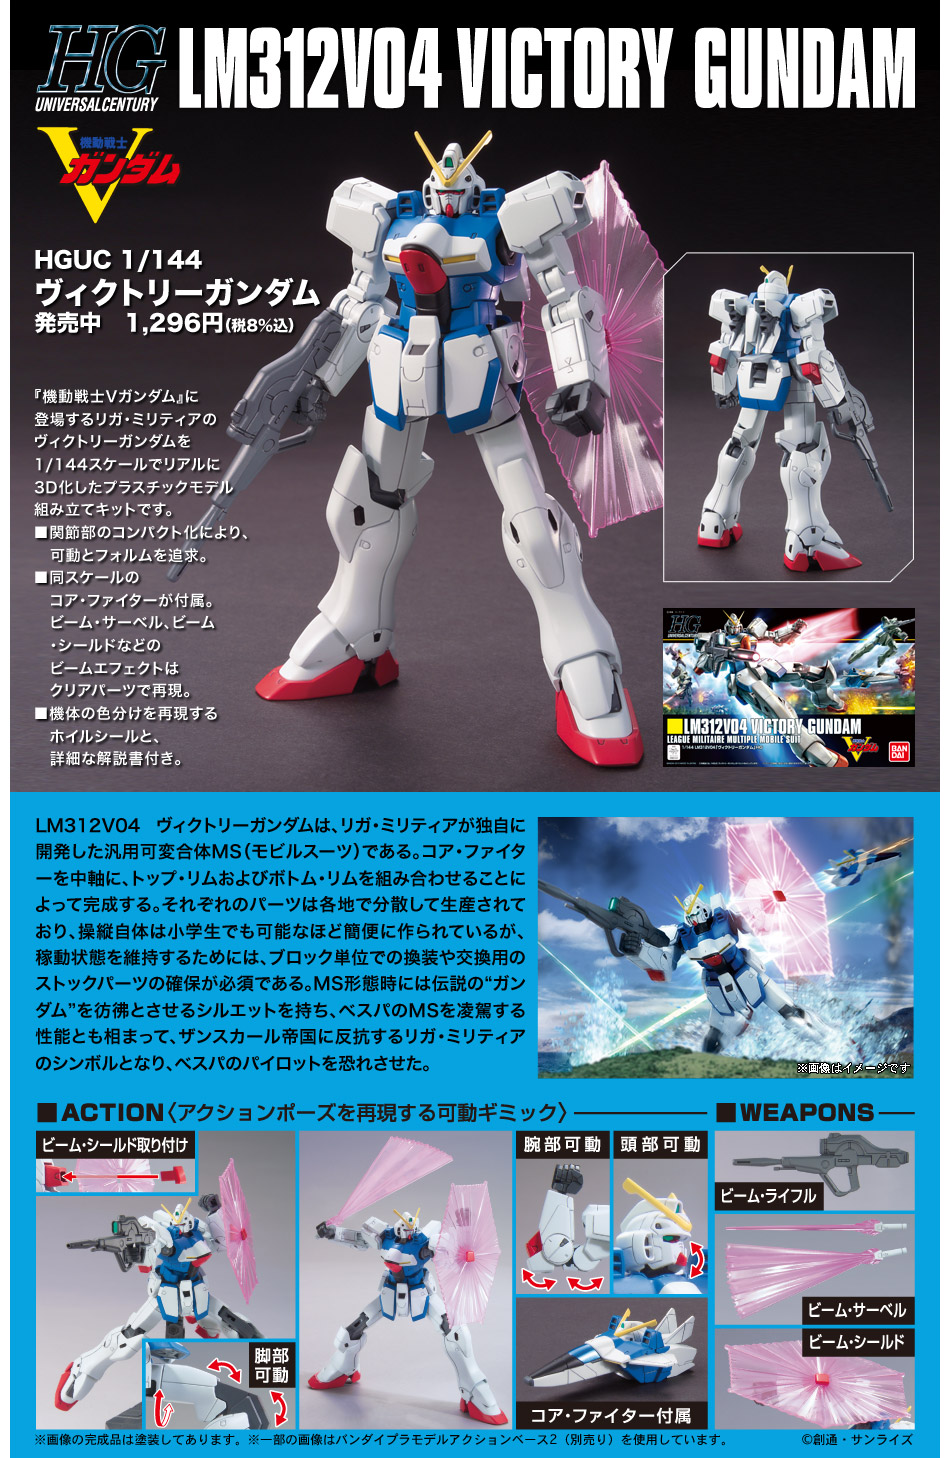 HGUC 1/144 LM312V04 ヴィクトリーガンダム [Victory Gundam] 公式商品説明(画像)